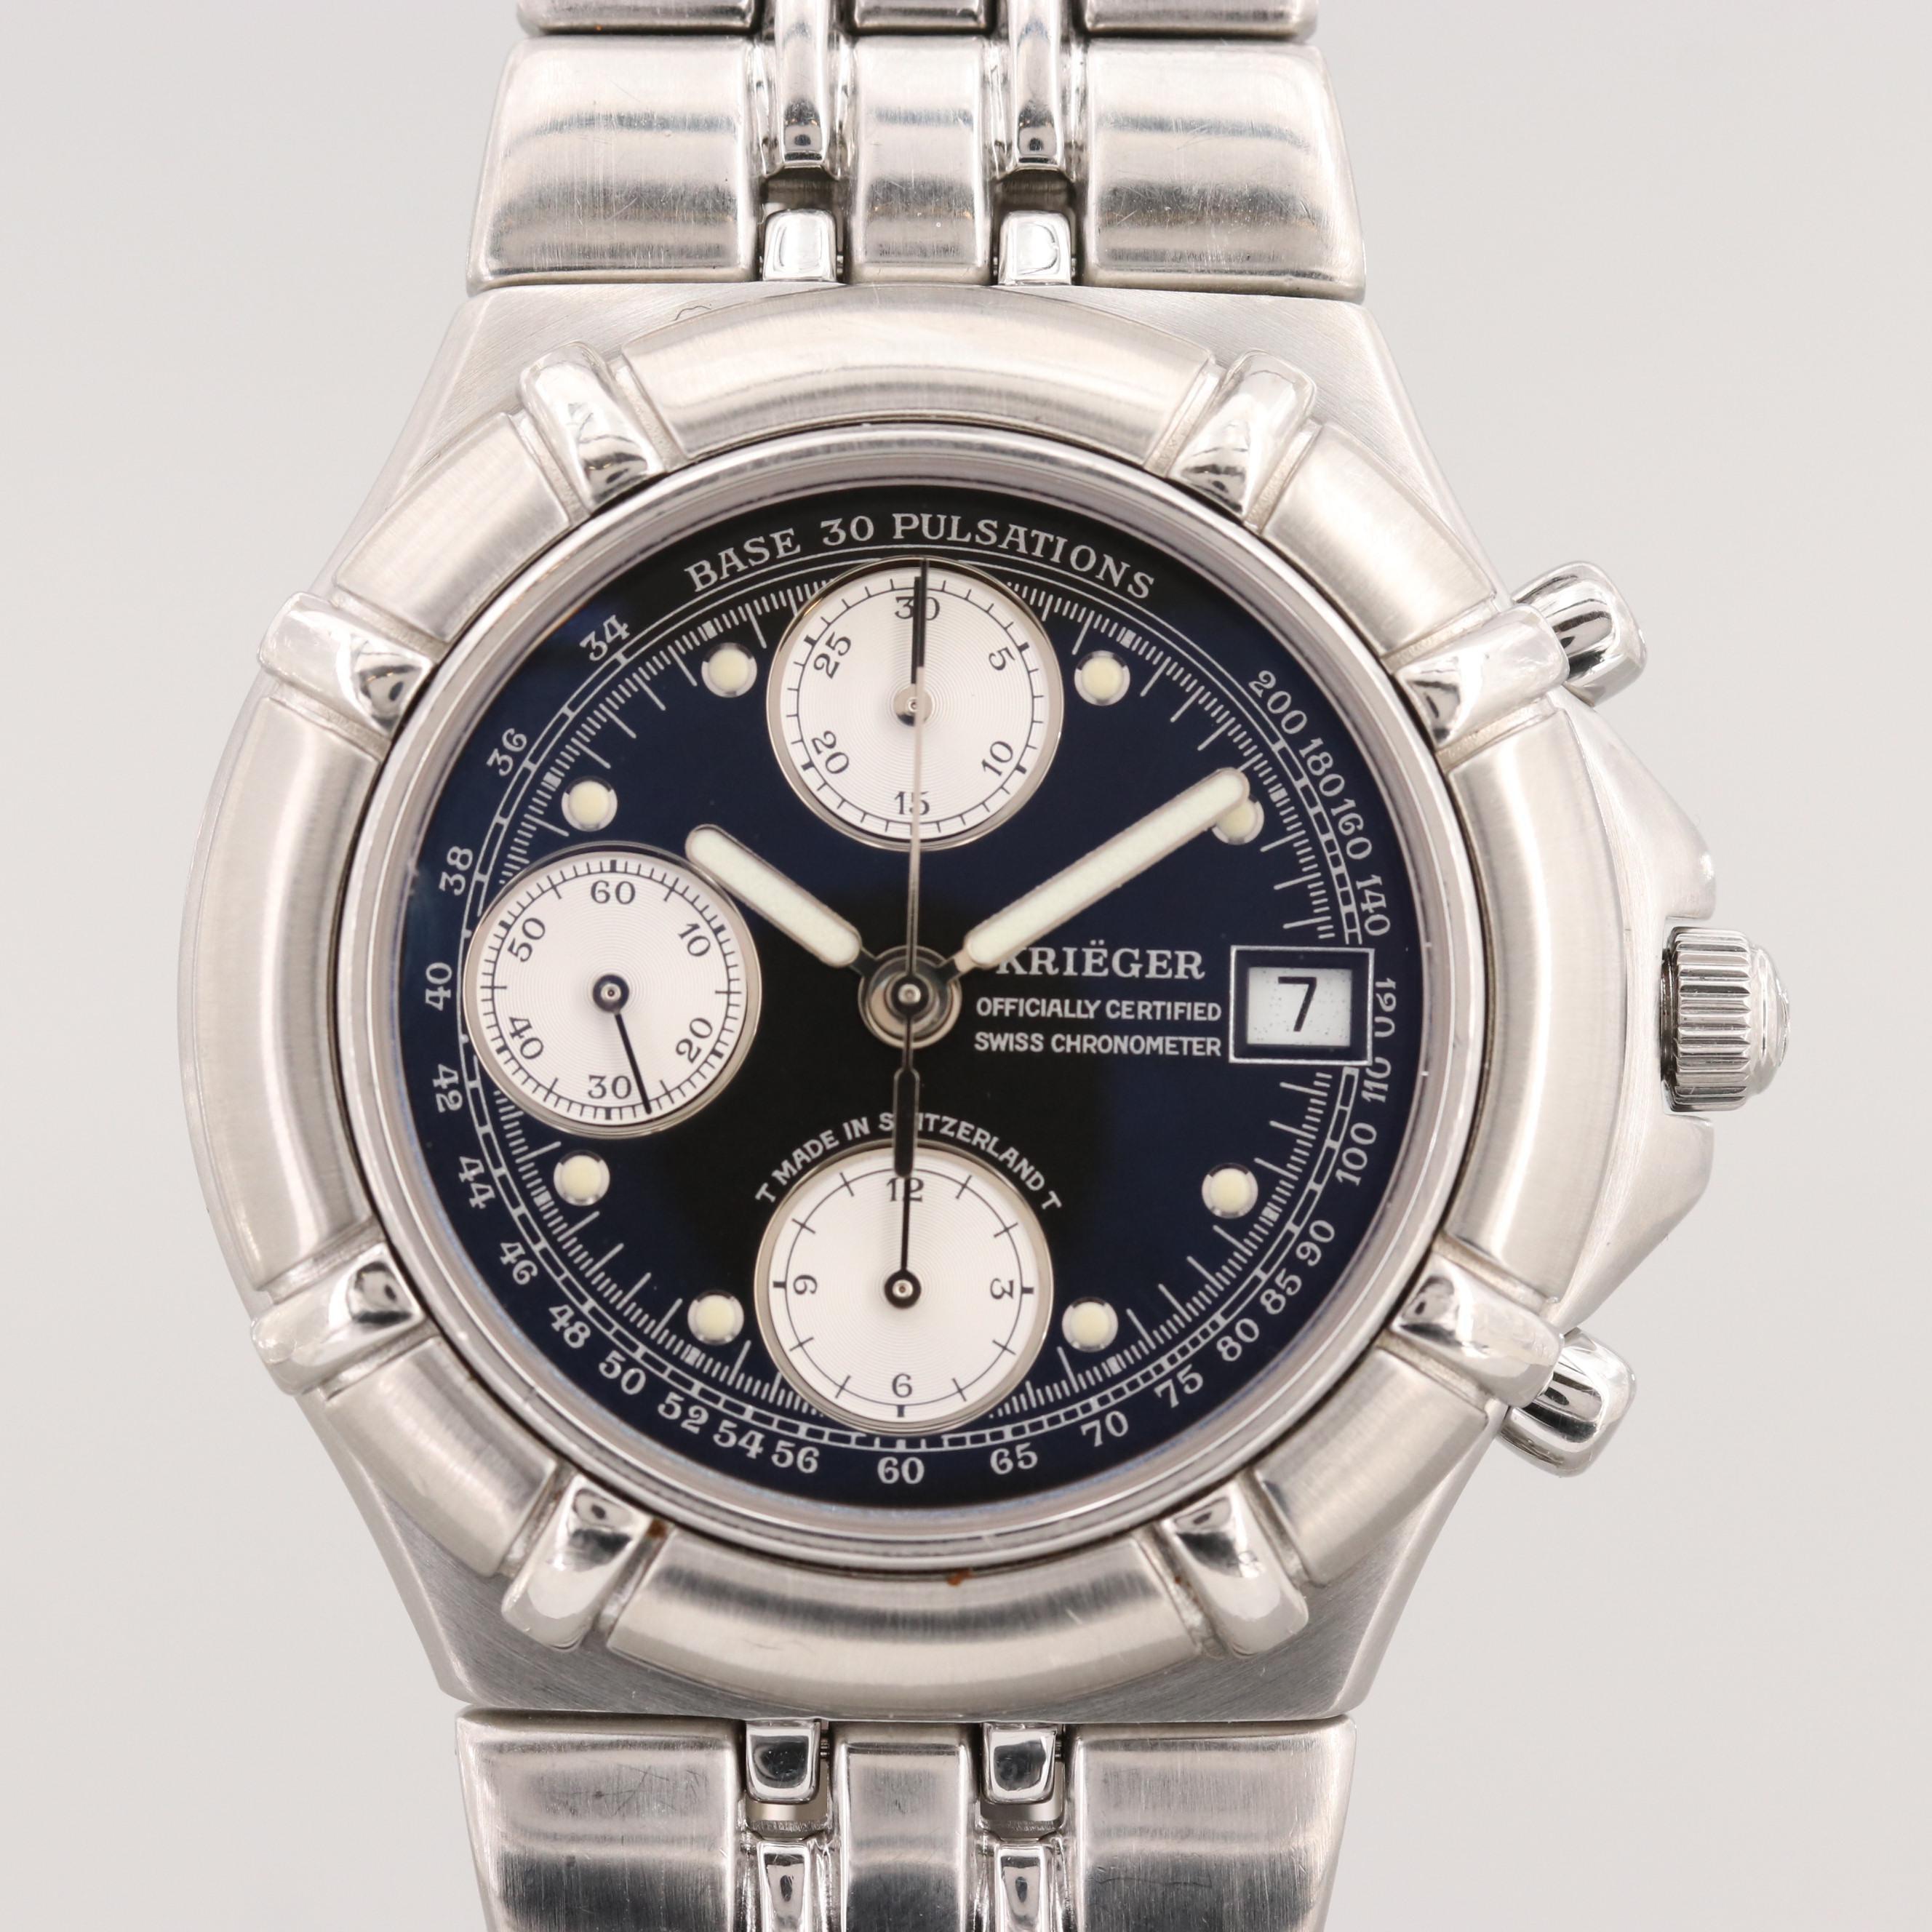 Kriëger Aficionado Stainless Steel Chronograph Automatic Wristwatch